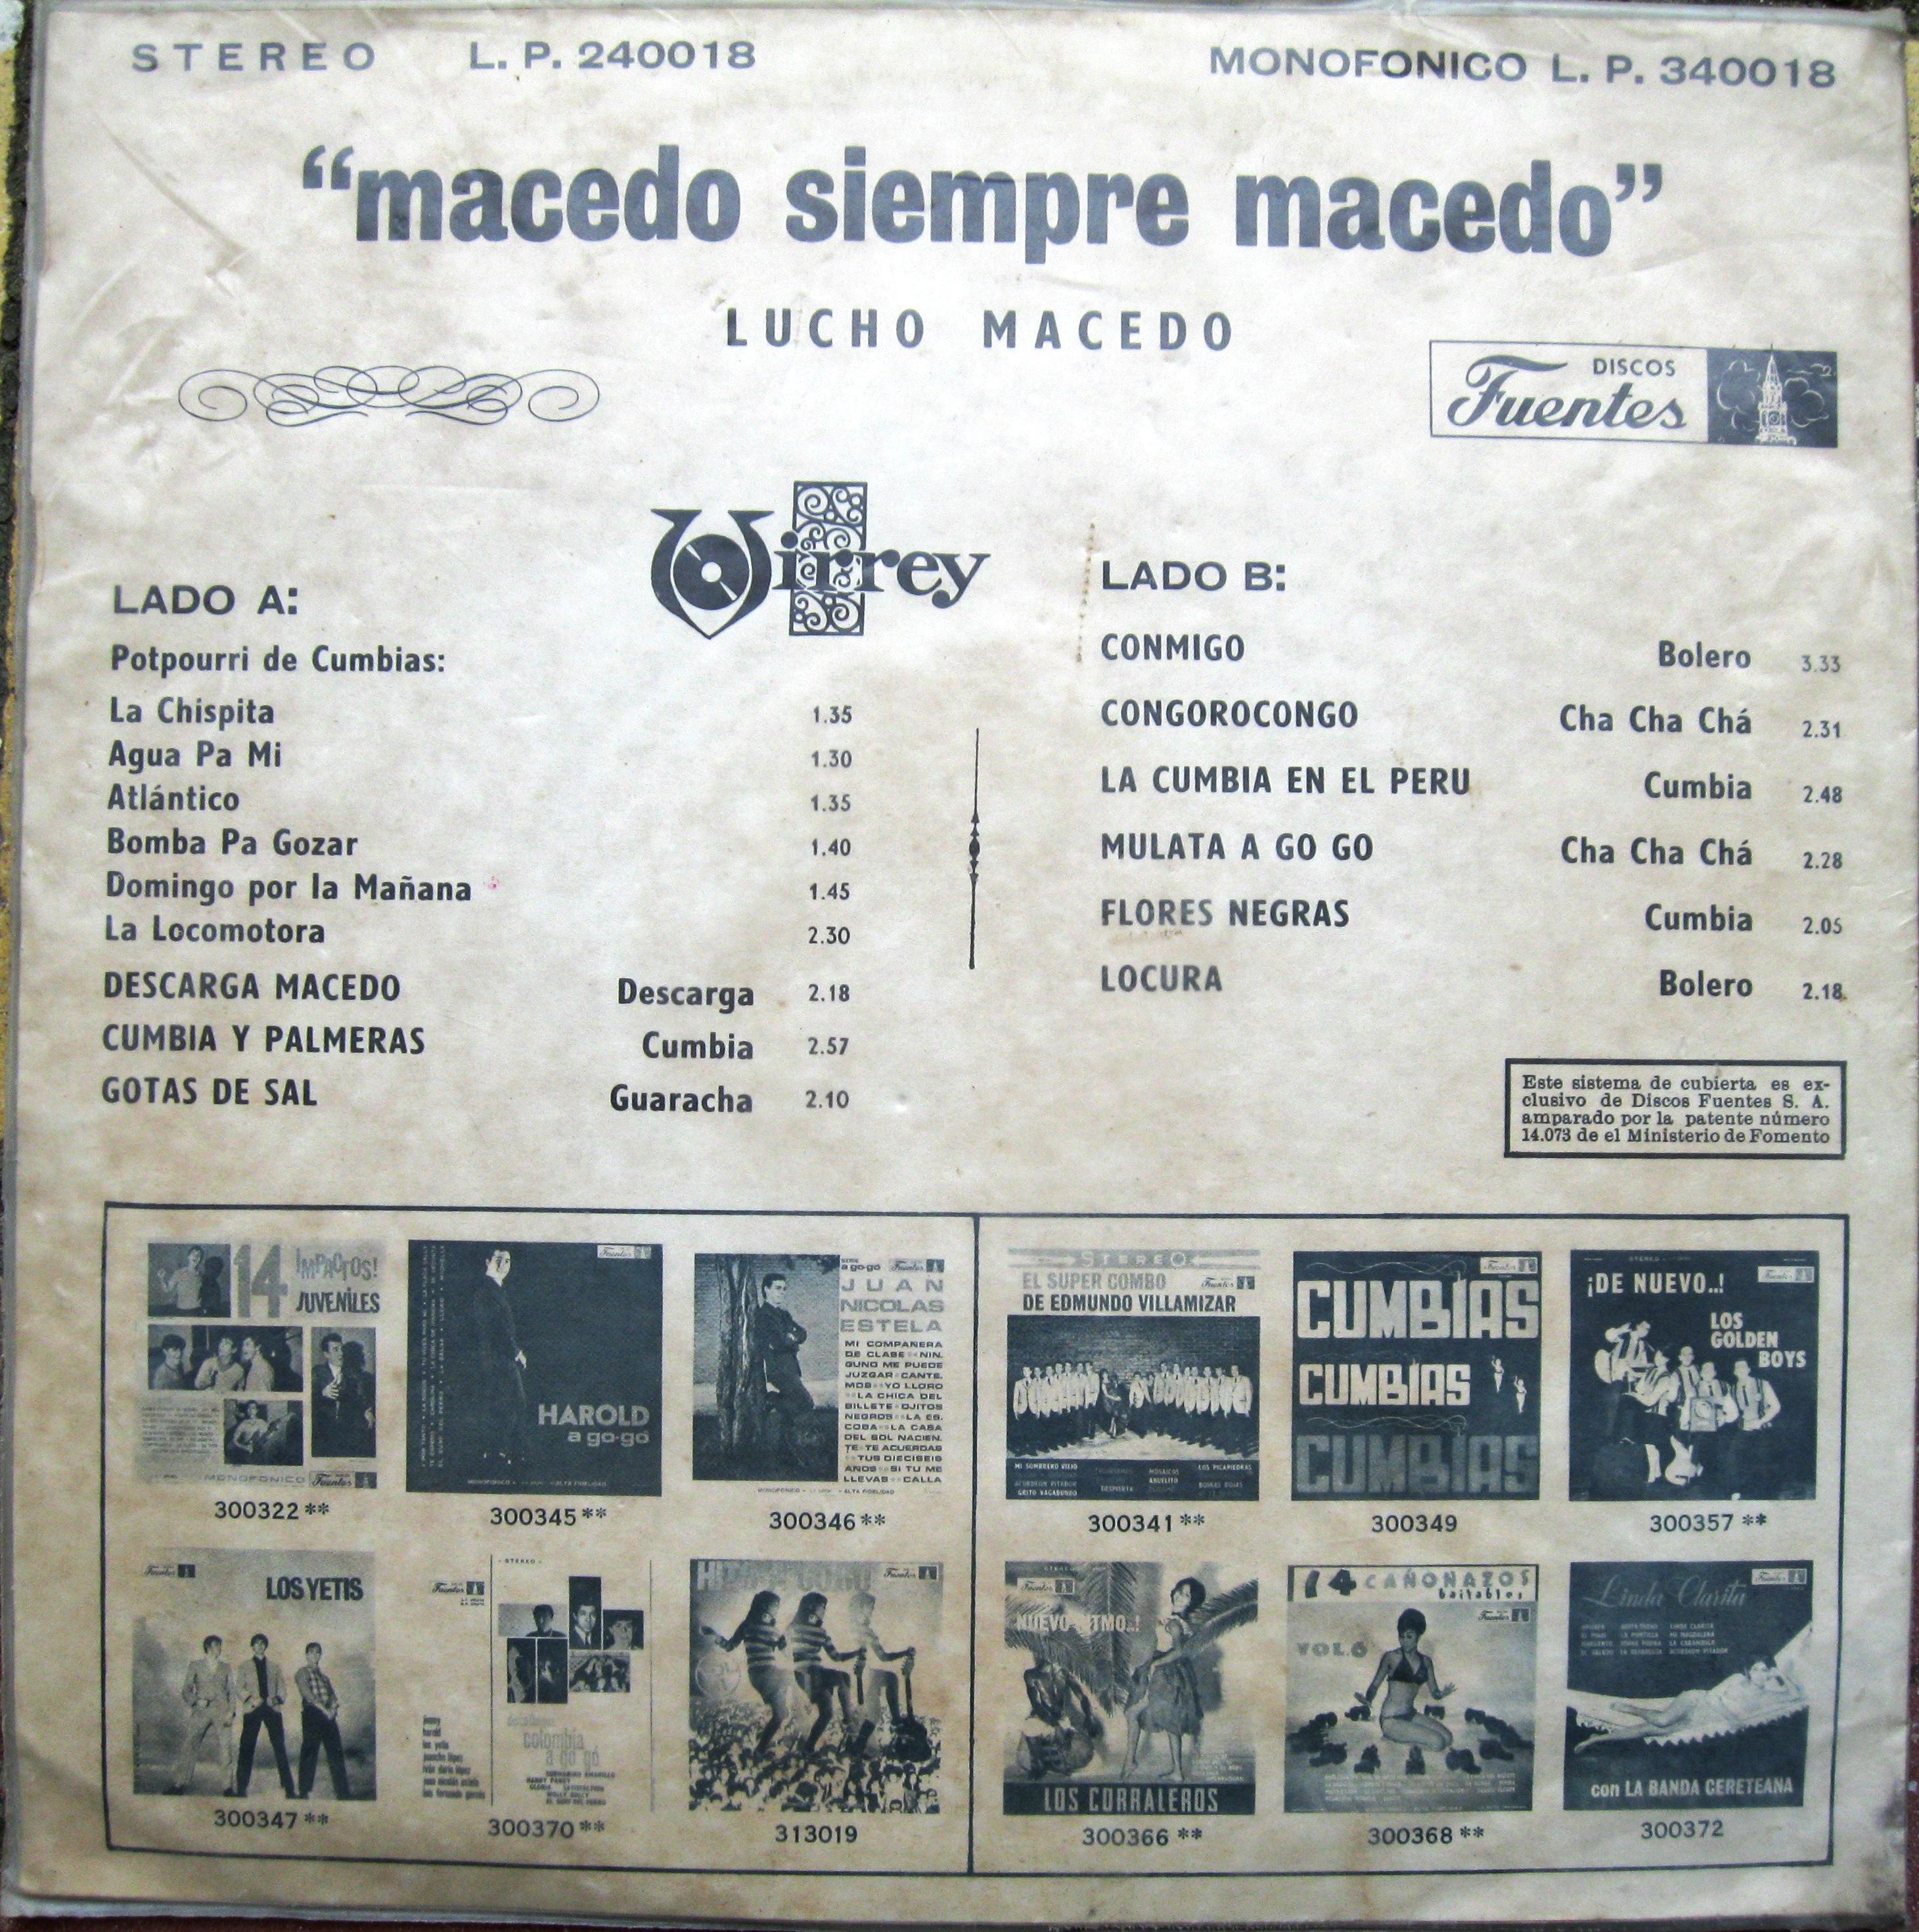 La Sonora De Lucho Macedo Cumbia Pompo Y Guaracha